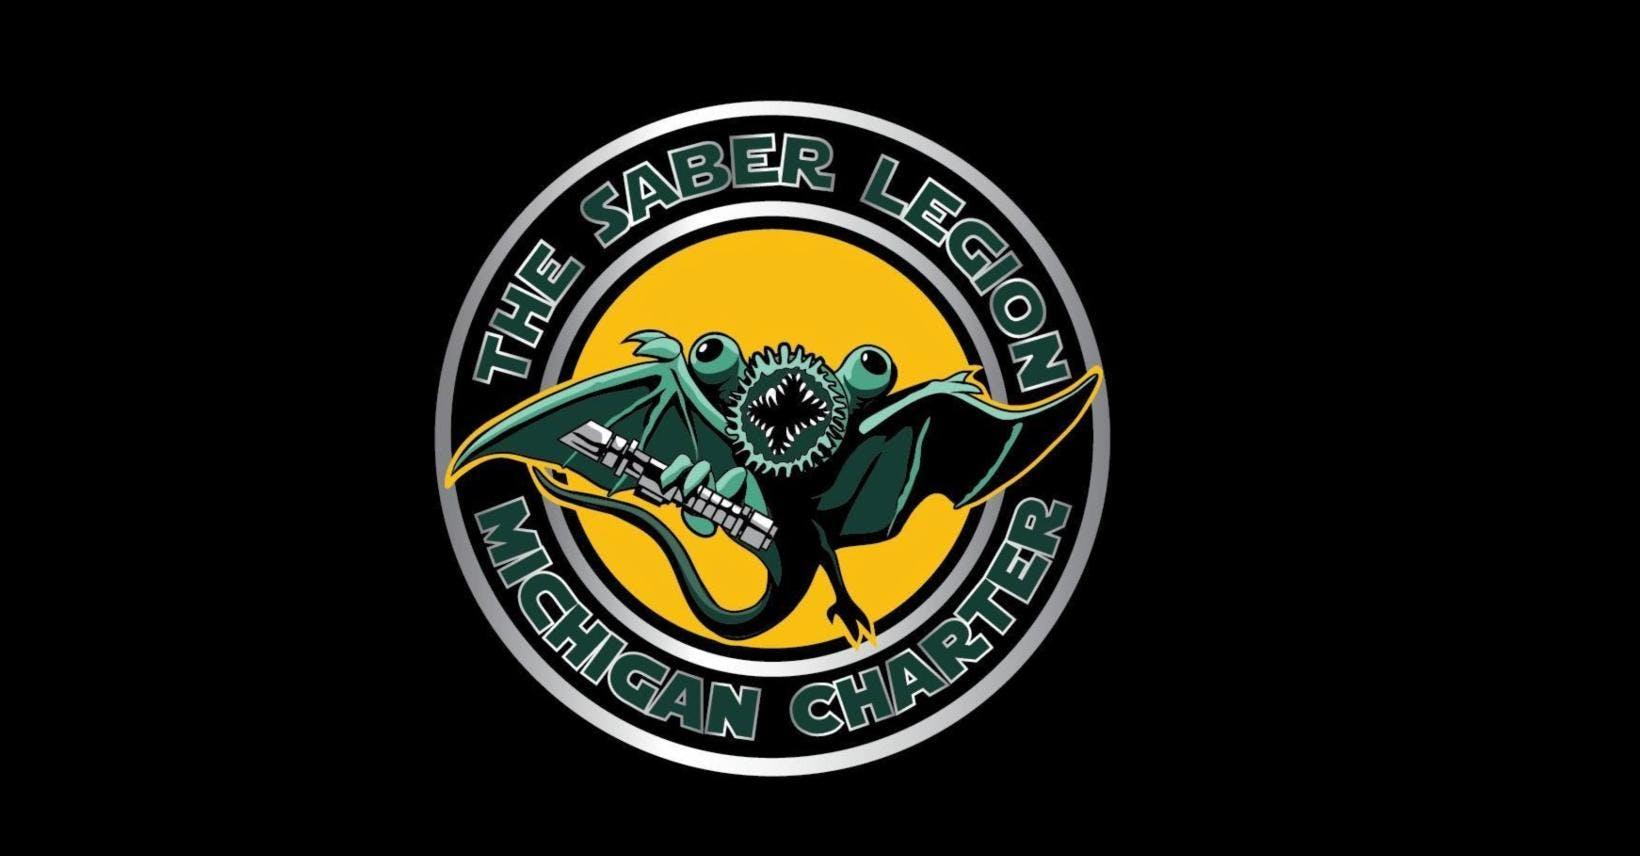 The Saber Legion - Michigan Charter Practice